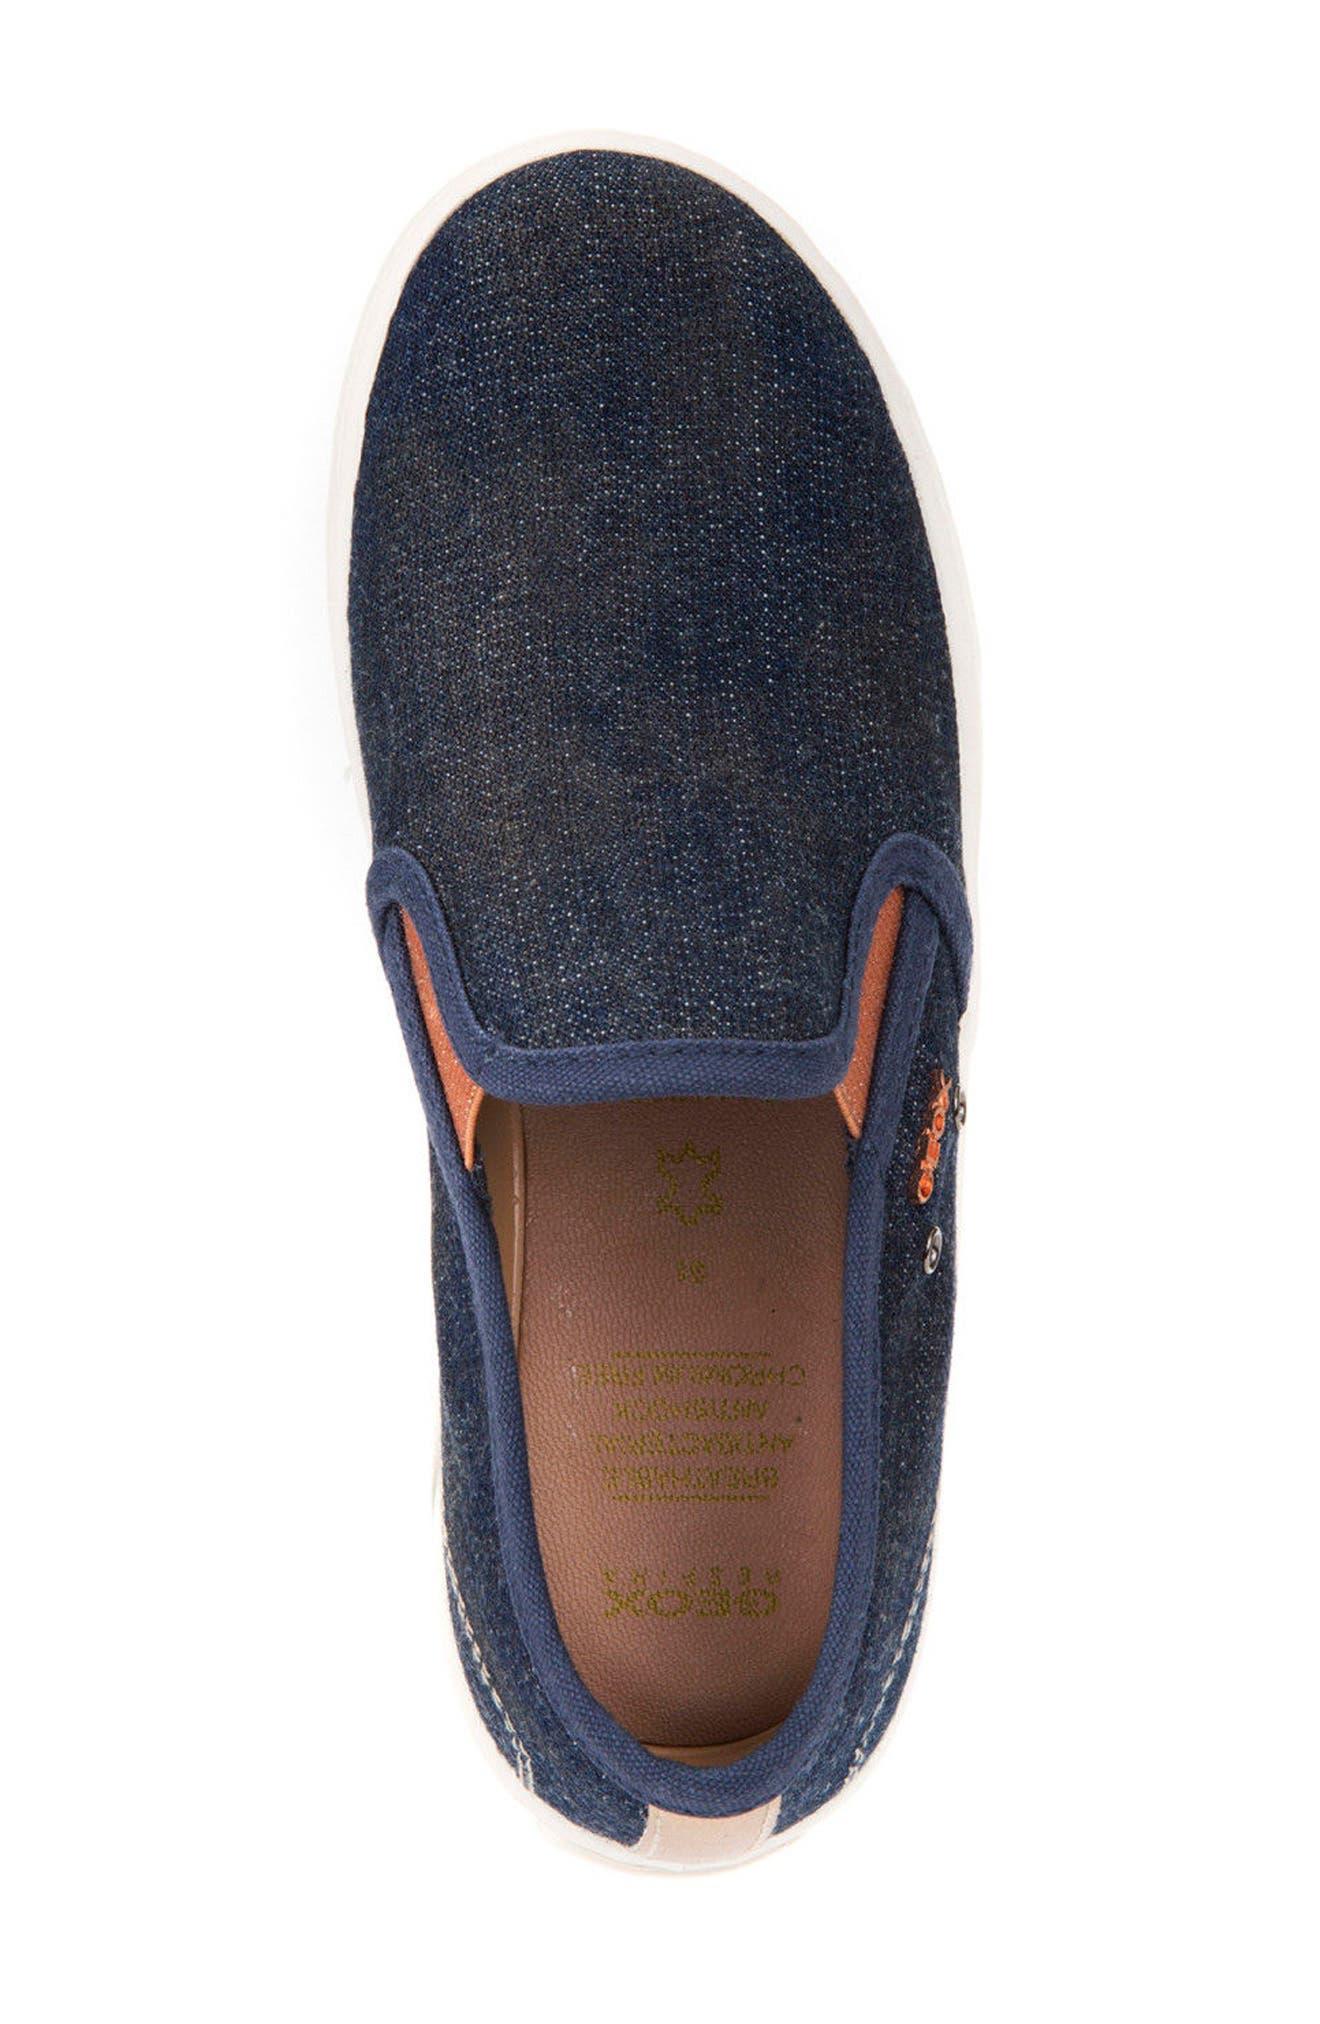 Jr Kiwi Slip-On Waterproof Sneaker,                             Alternate thumbnail 5, color,                             JEANS